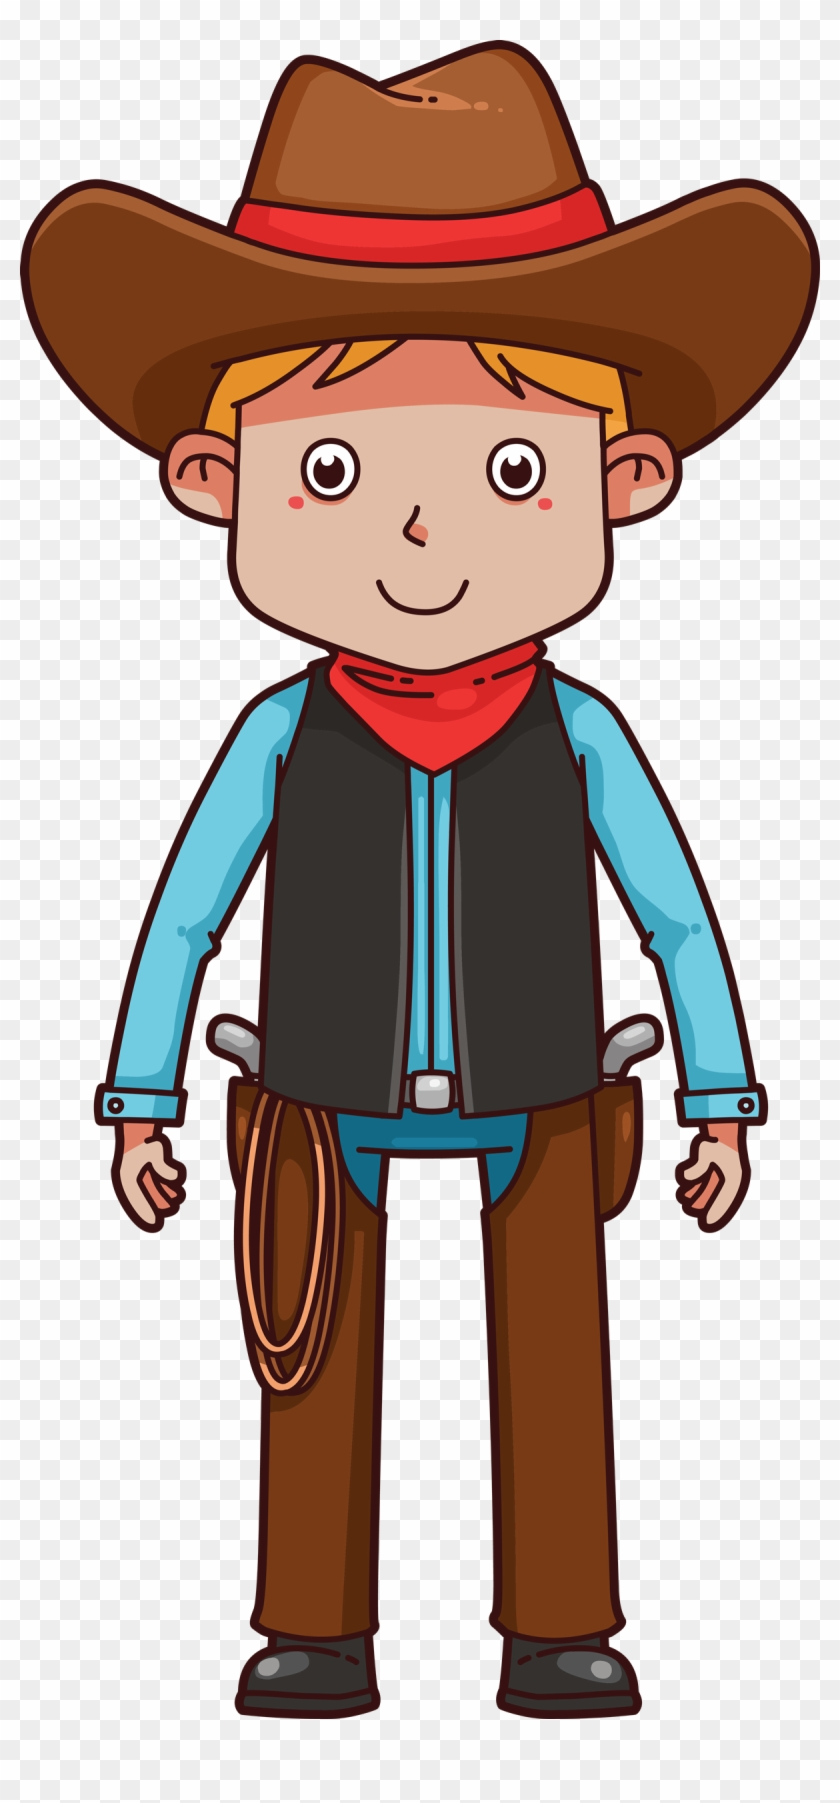 Cowboy Clipart School - Cartoon Cowboy #271592